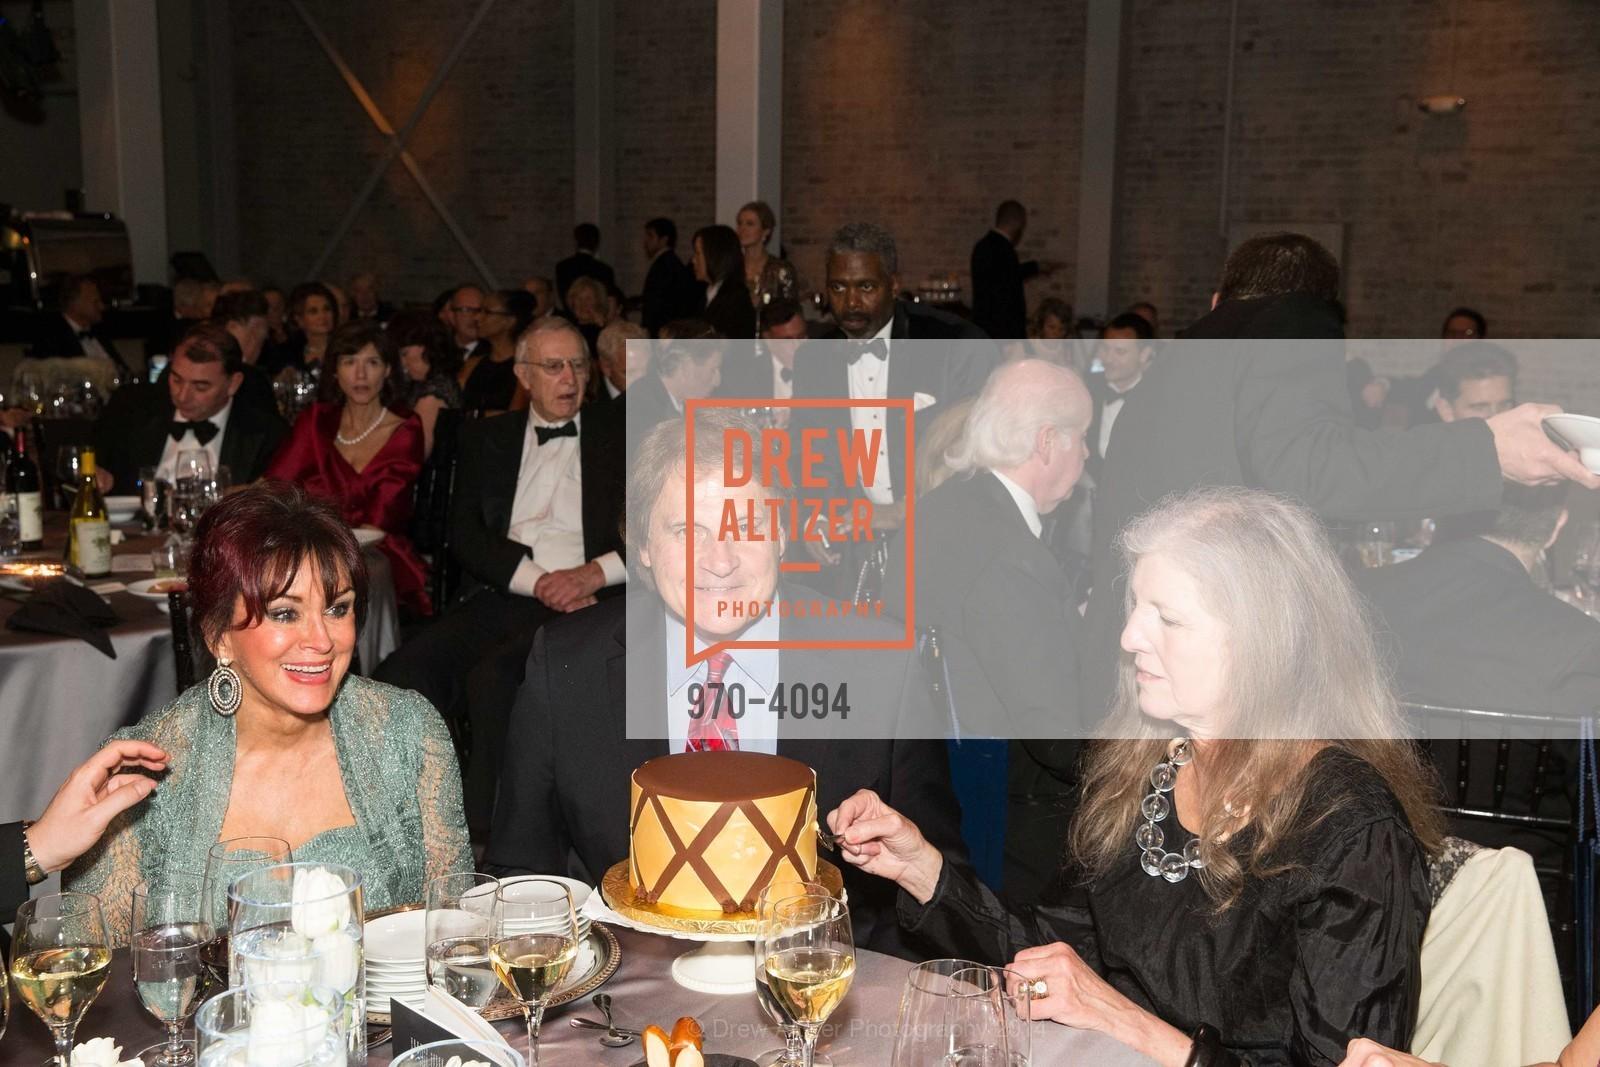 Elaine La Russa, Tony La Russa, Leah Garchik, Photo #970-4094